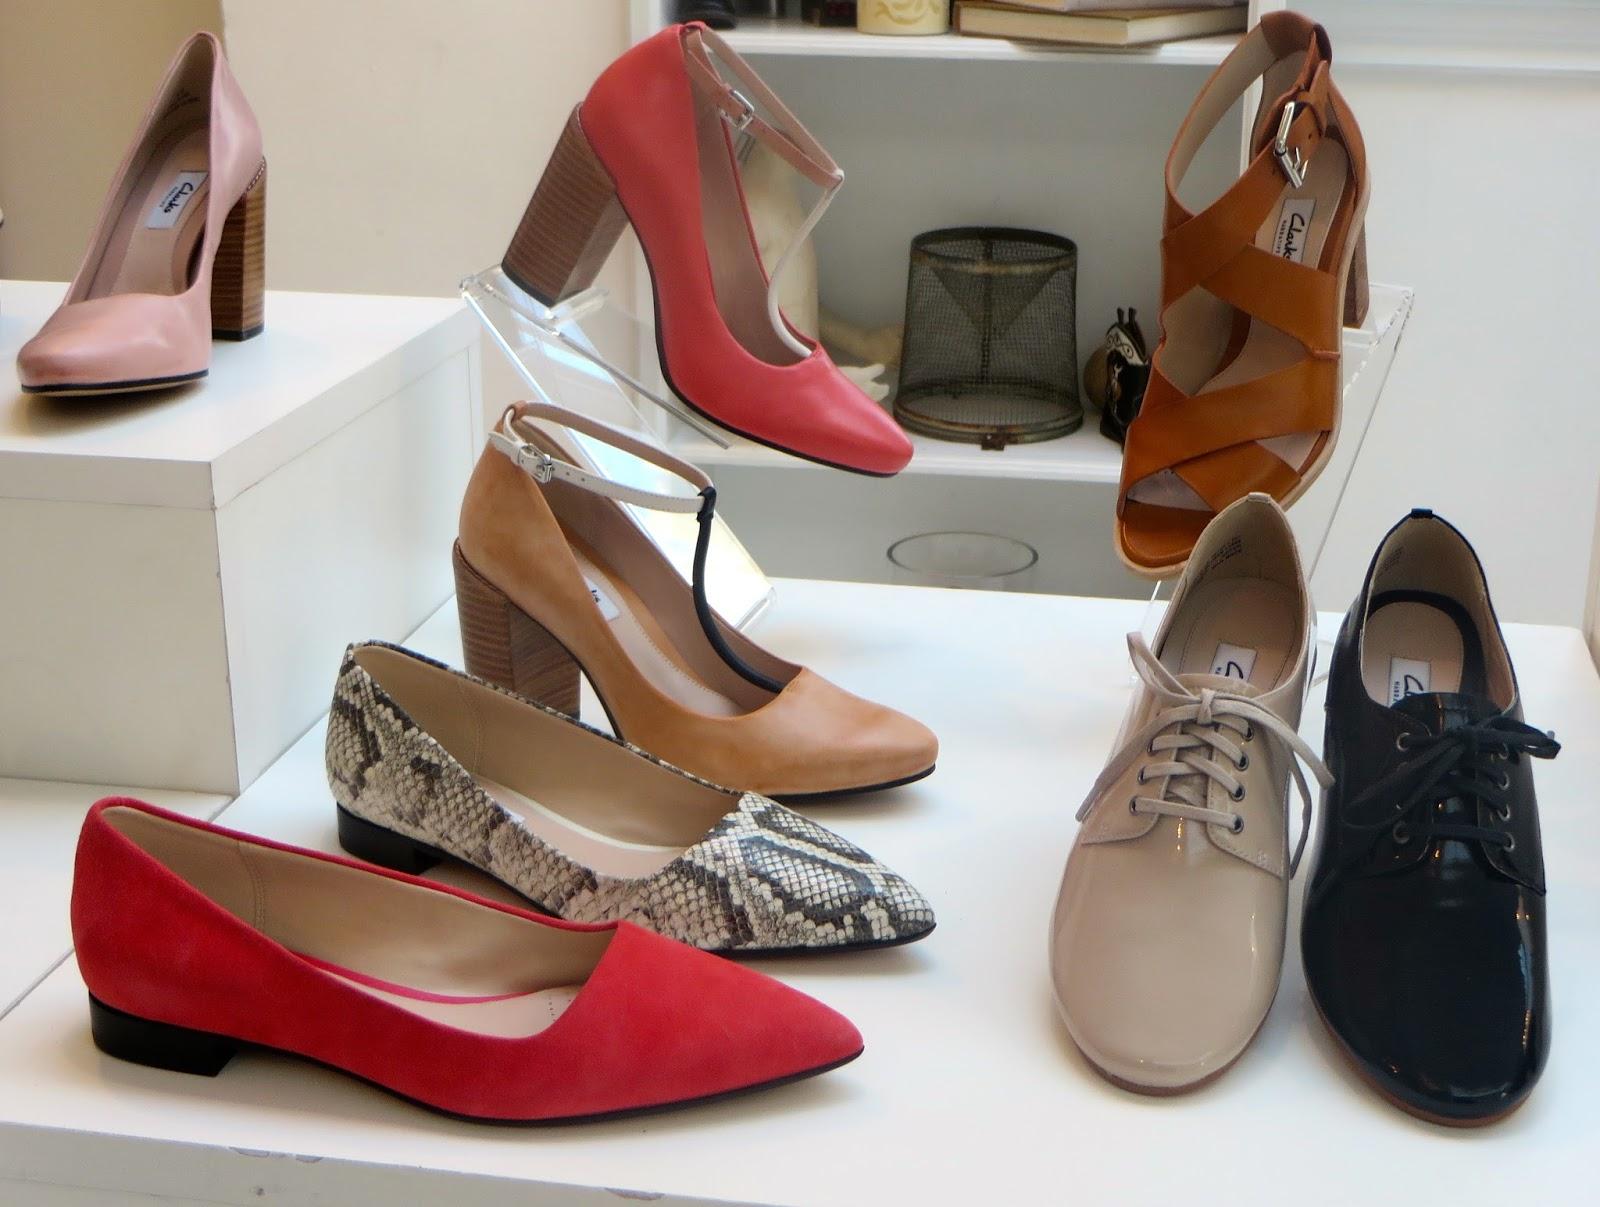 3308e76dfbed Women s-Sandals Shoes- ClarksSS2015